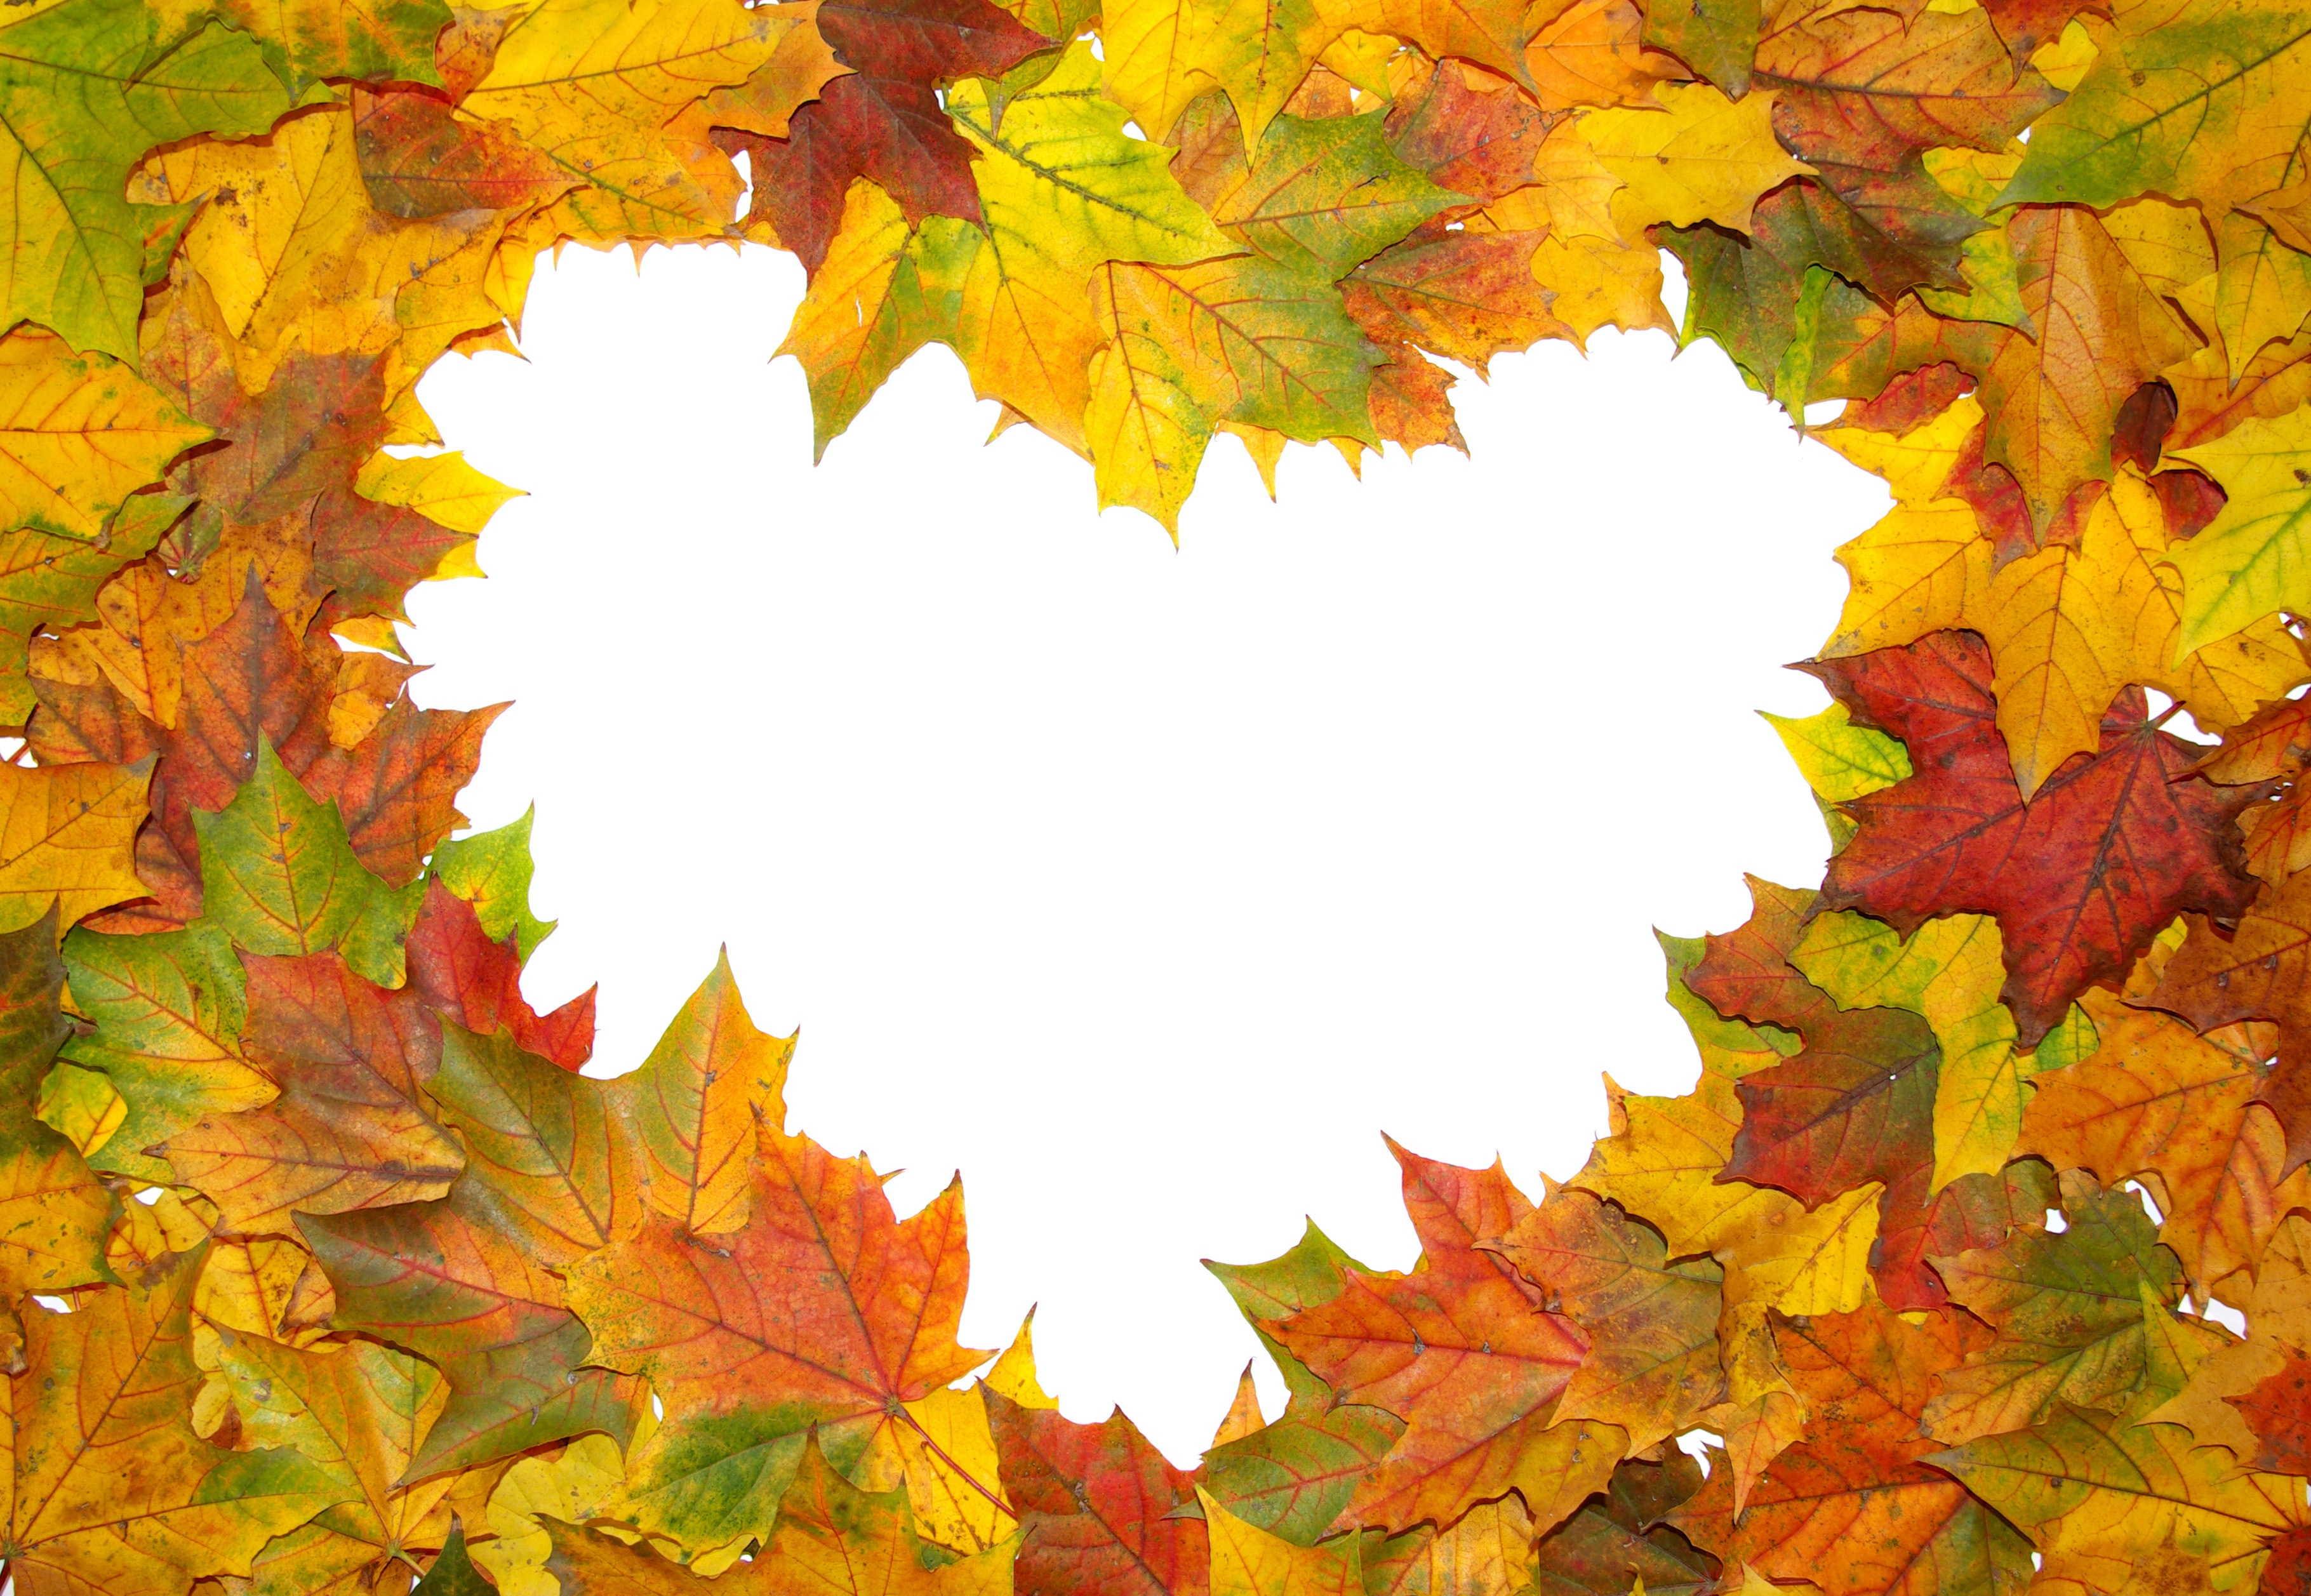 Maple Leaf Wallpaper For Fall Season 15 Most Romantic Autumn Desktop Wallpapers Themescompany